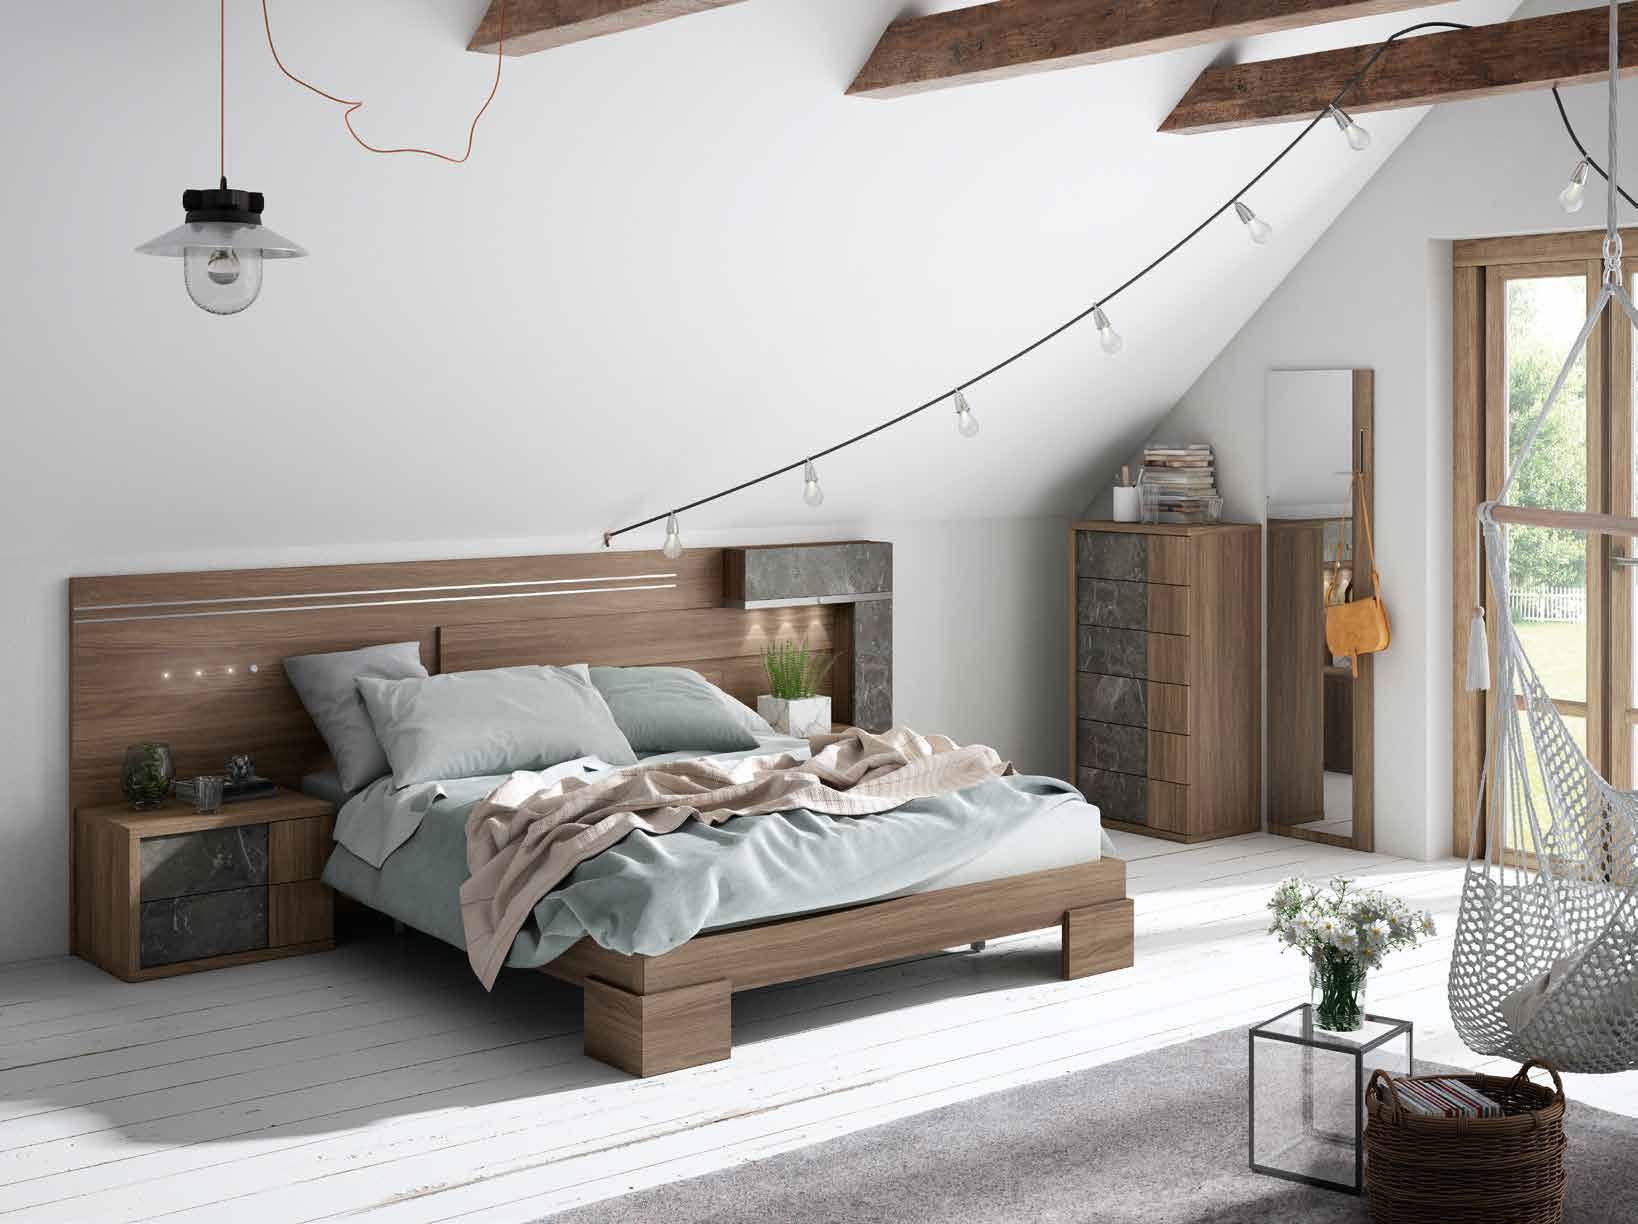 creta-dormitorio-gaia-10